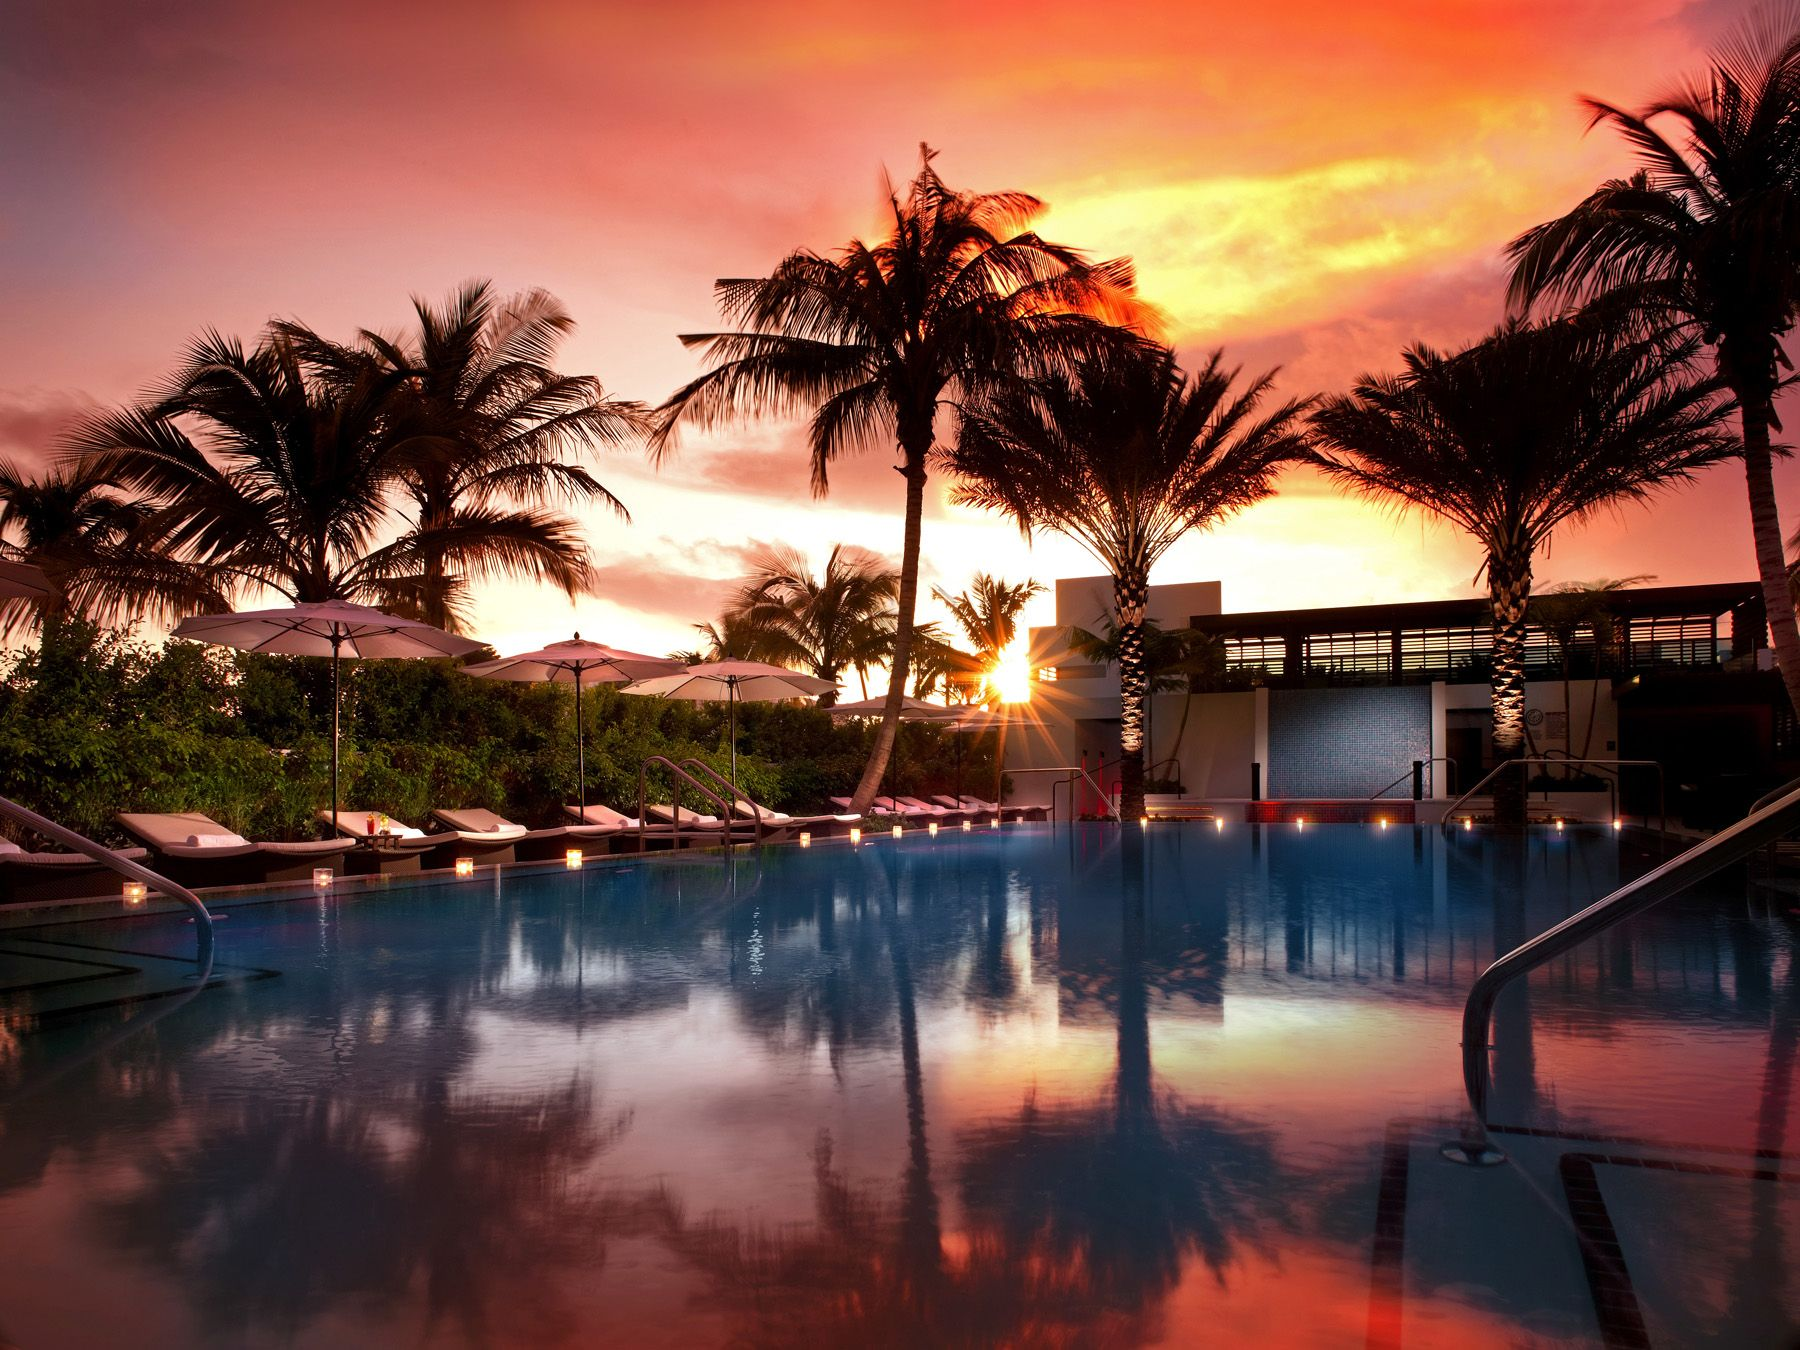 Sunset Beach Hotel Florida The Best Beaches In World